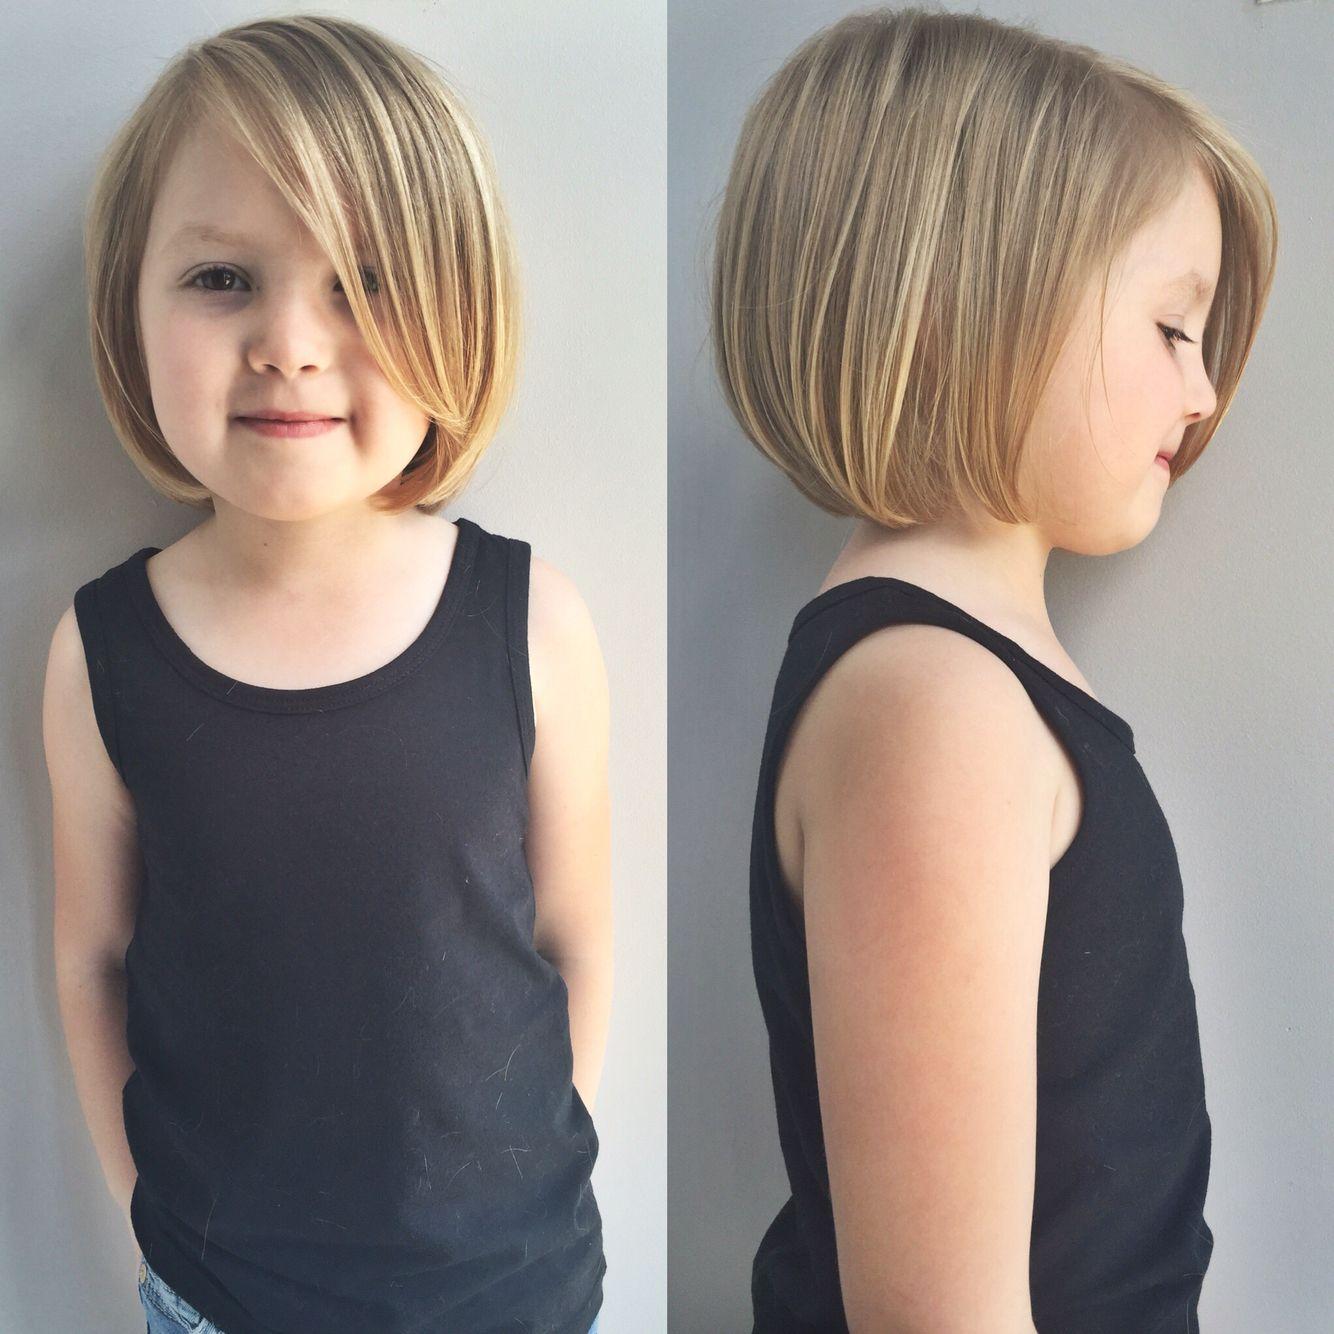 Kids Hairstyles Little Girls Haircut Kids Haircut Haircuts For Kids Haircuts For Little Gir Little Girl Haircuts Toddler Girl Haircut Bob Haircut For Girls